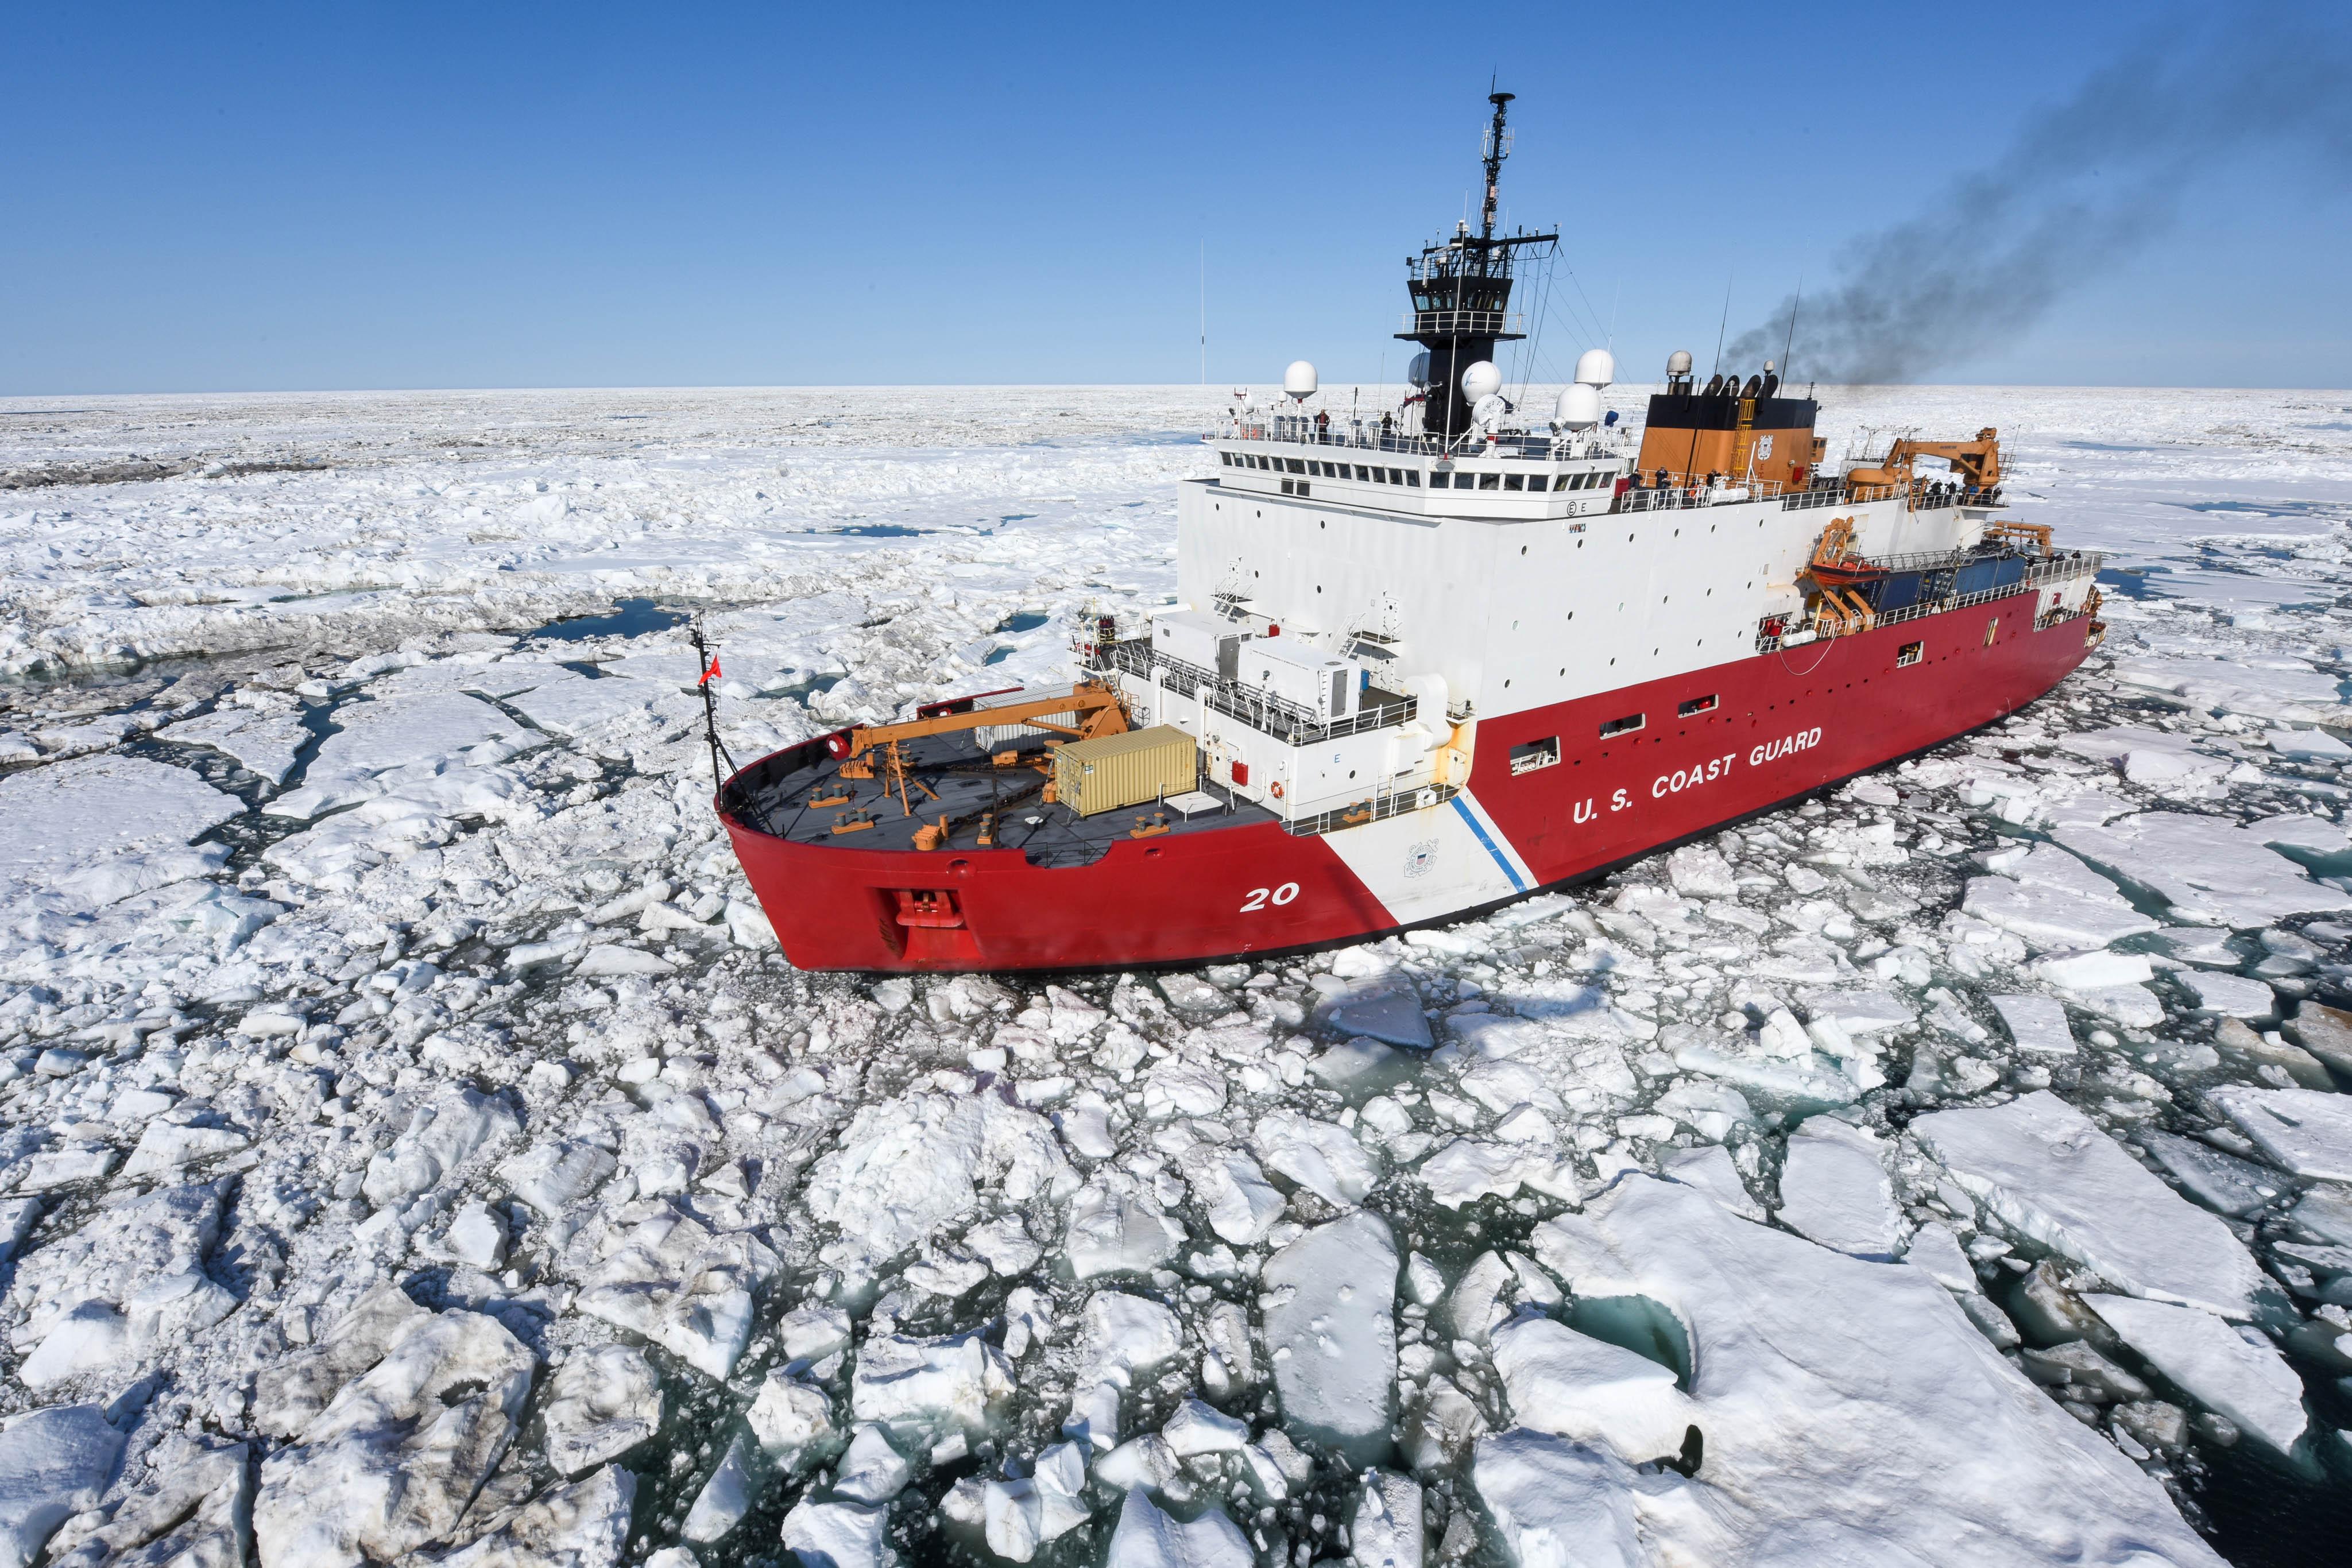 U.S. Coast Guard announces plans for a third heavy icebreaker